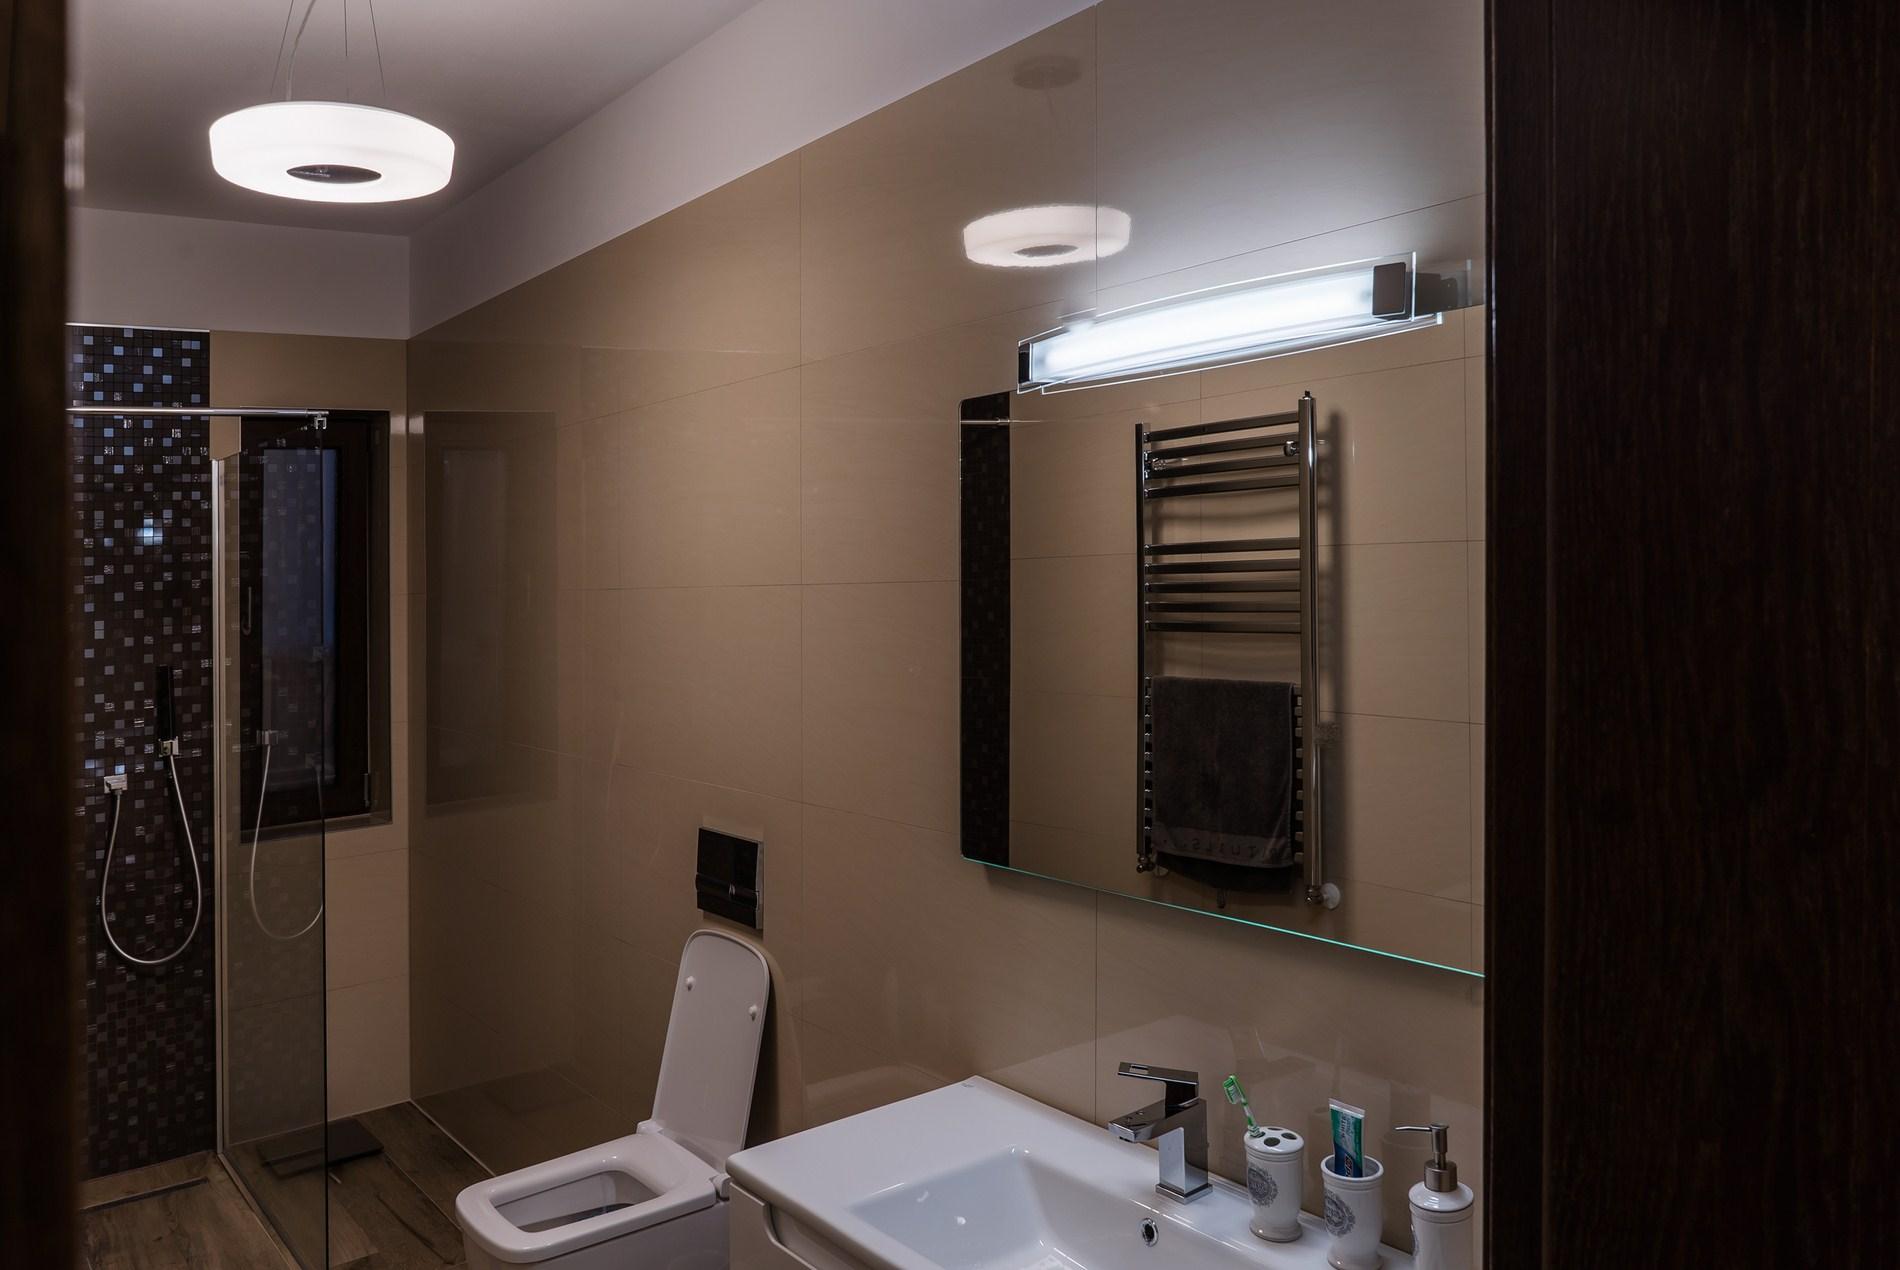 Aplica tub fluorescent baie Redo Glance - Proiect iluminat locuinta Annora Lighting